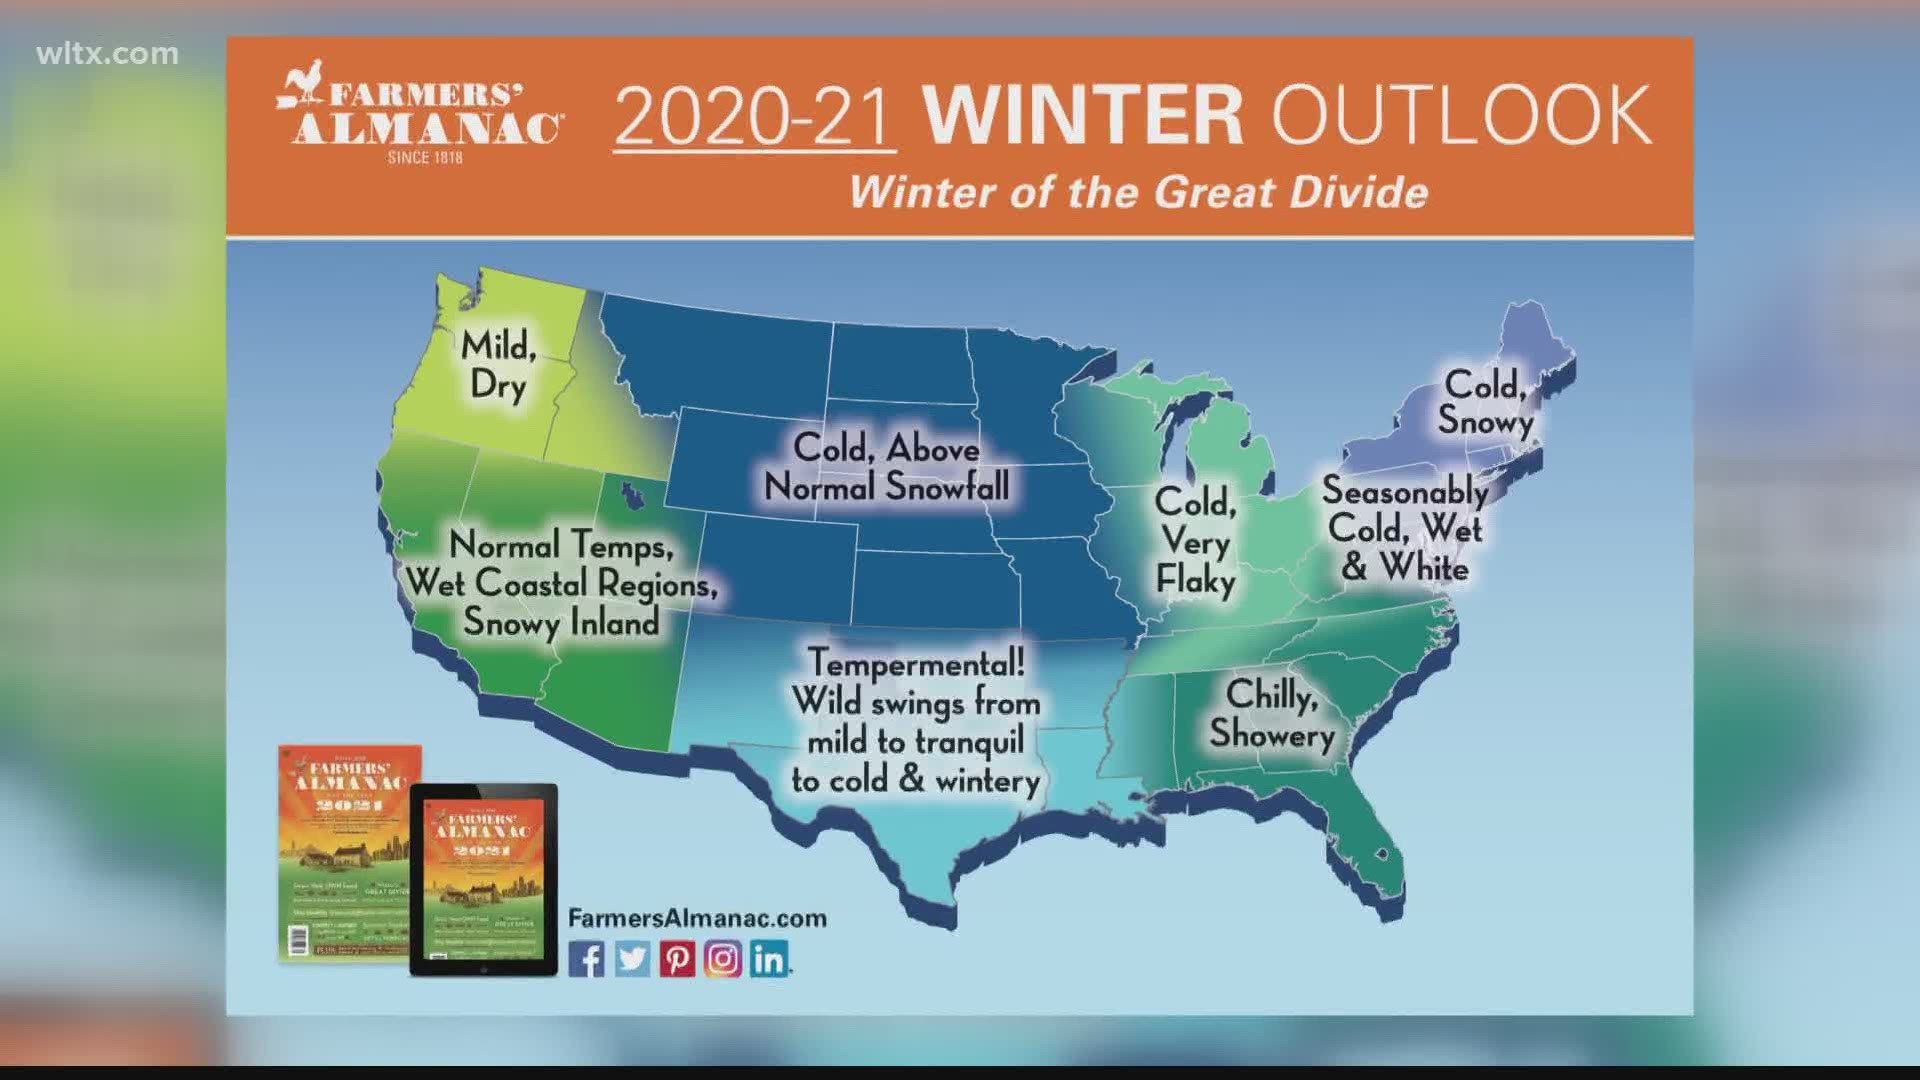 Farmers Almanac White Christmas 2020 Farmers Almanac predicts 'Winter of Great Divide' for America